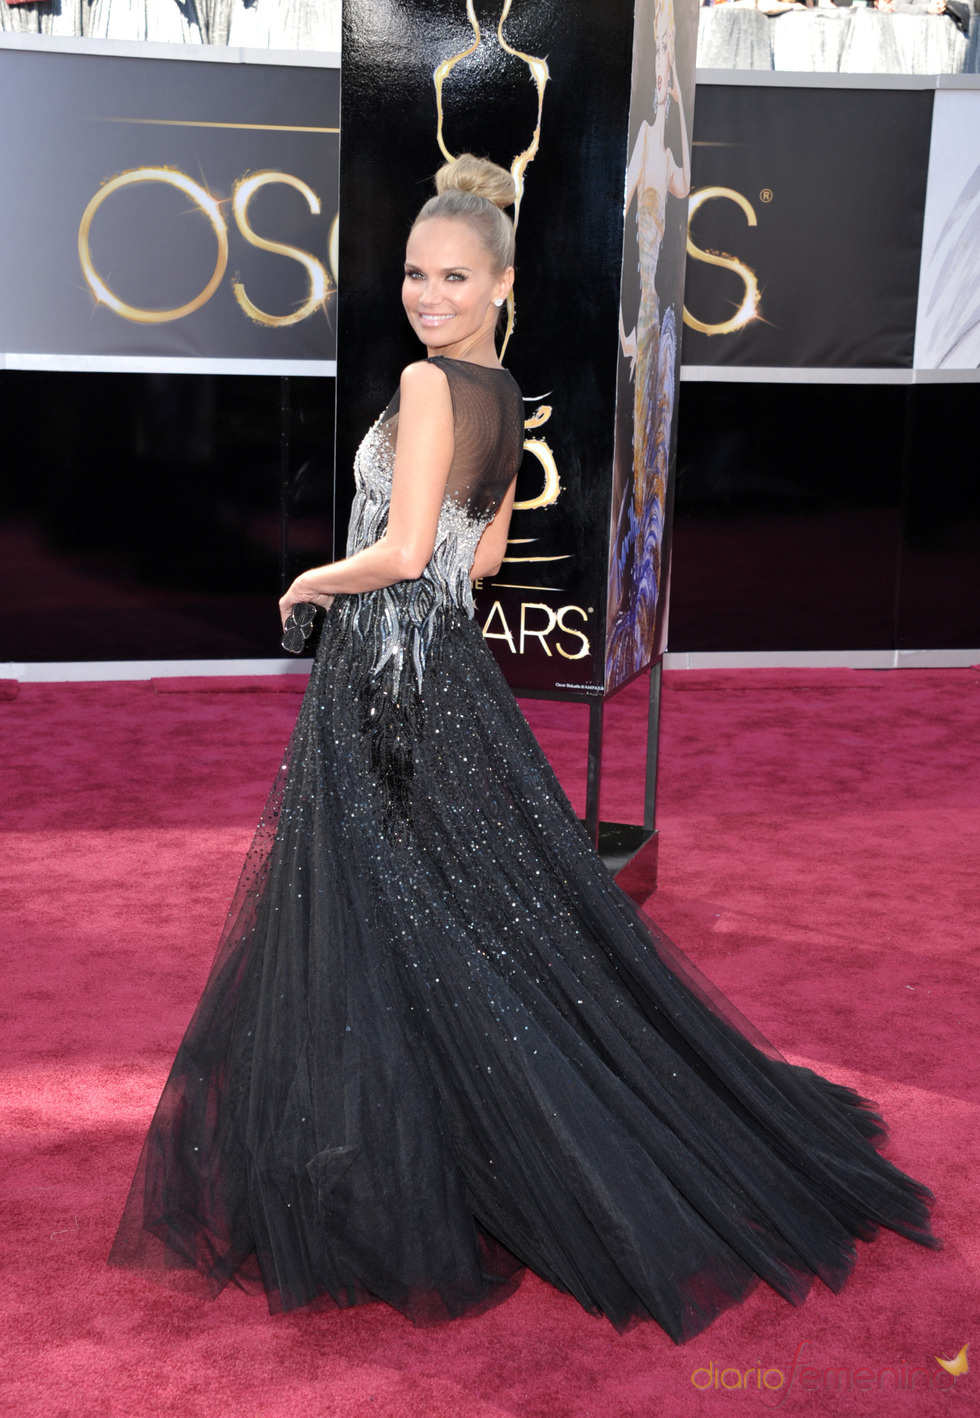 Kristin Chenoweth en la alfombra roja de los Oscars 2013